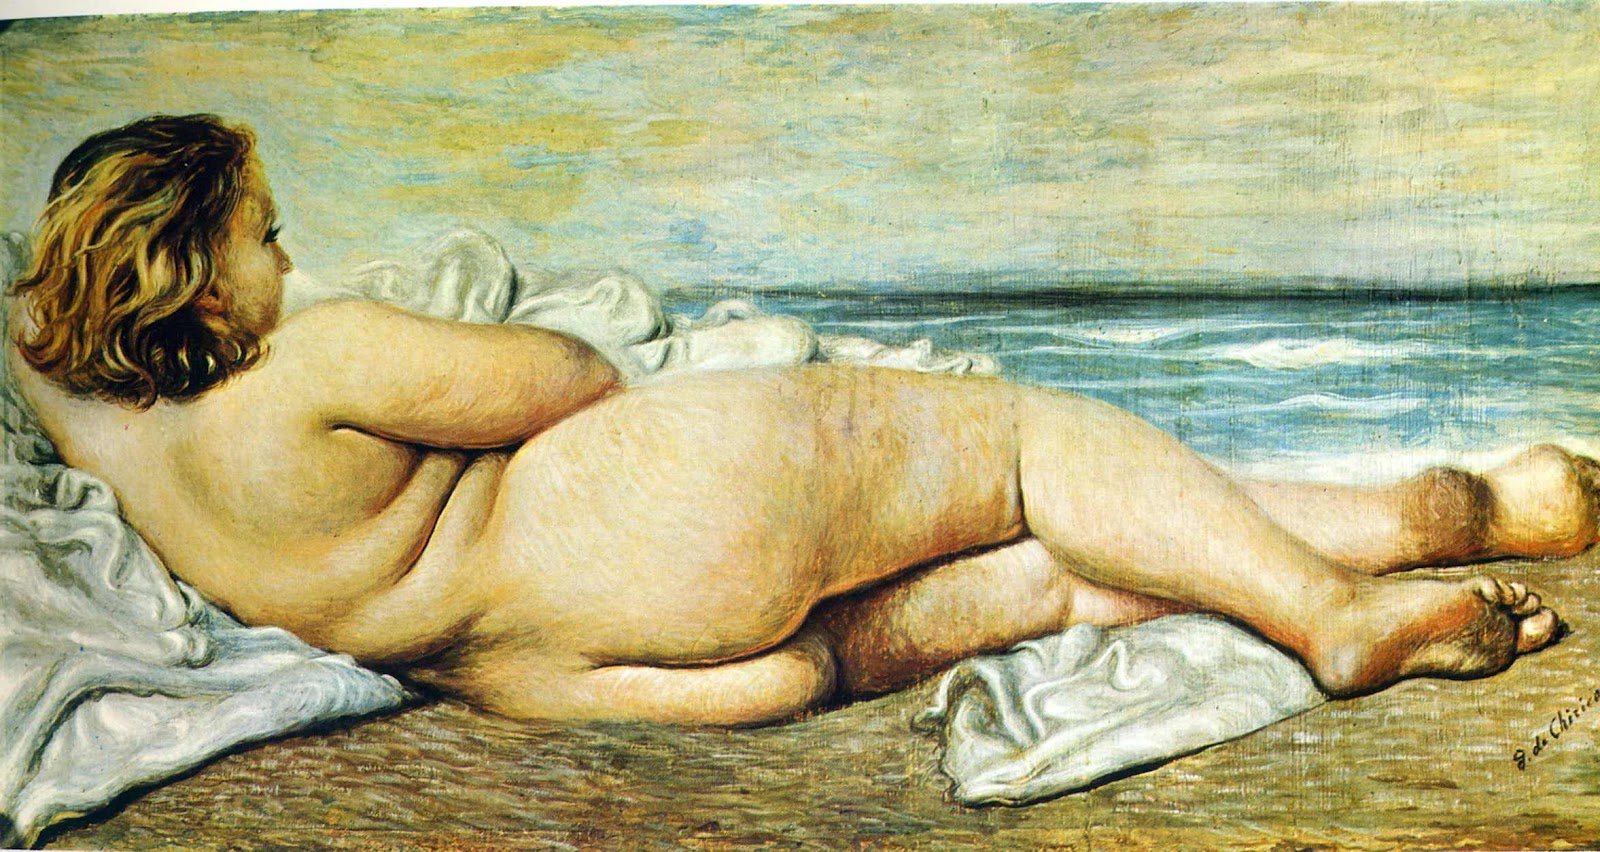 Nude Woman On The Beach, Giorgio de Chirico, 1932